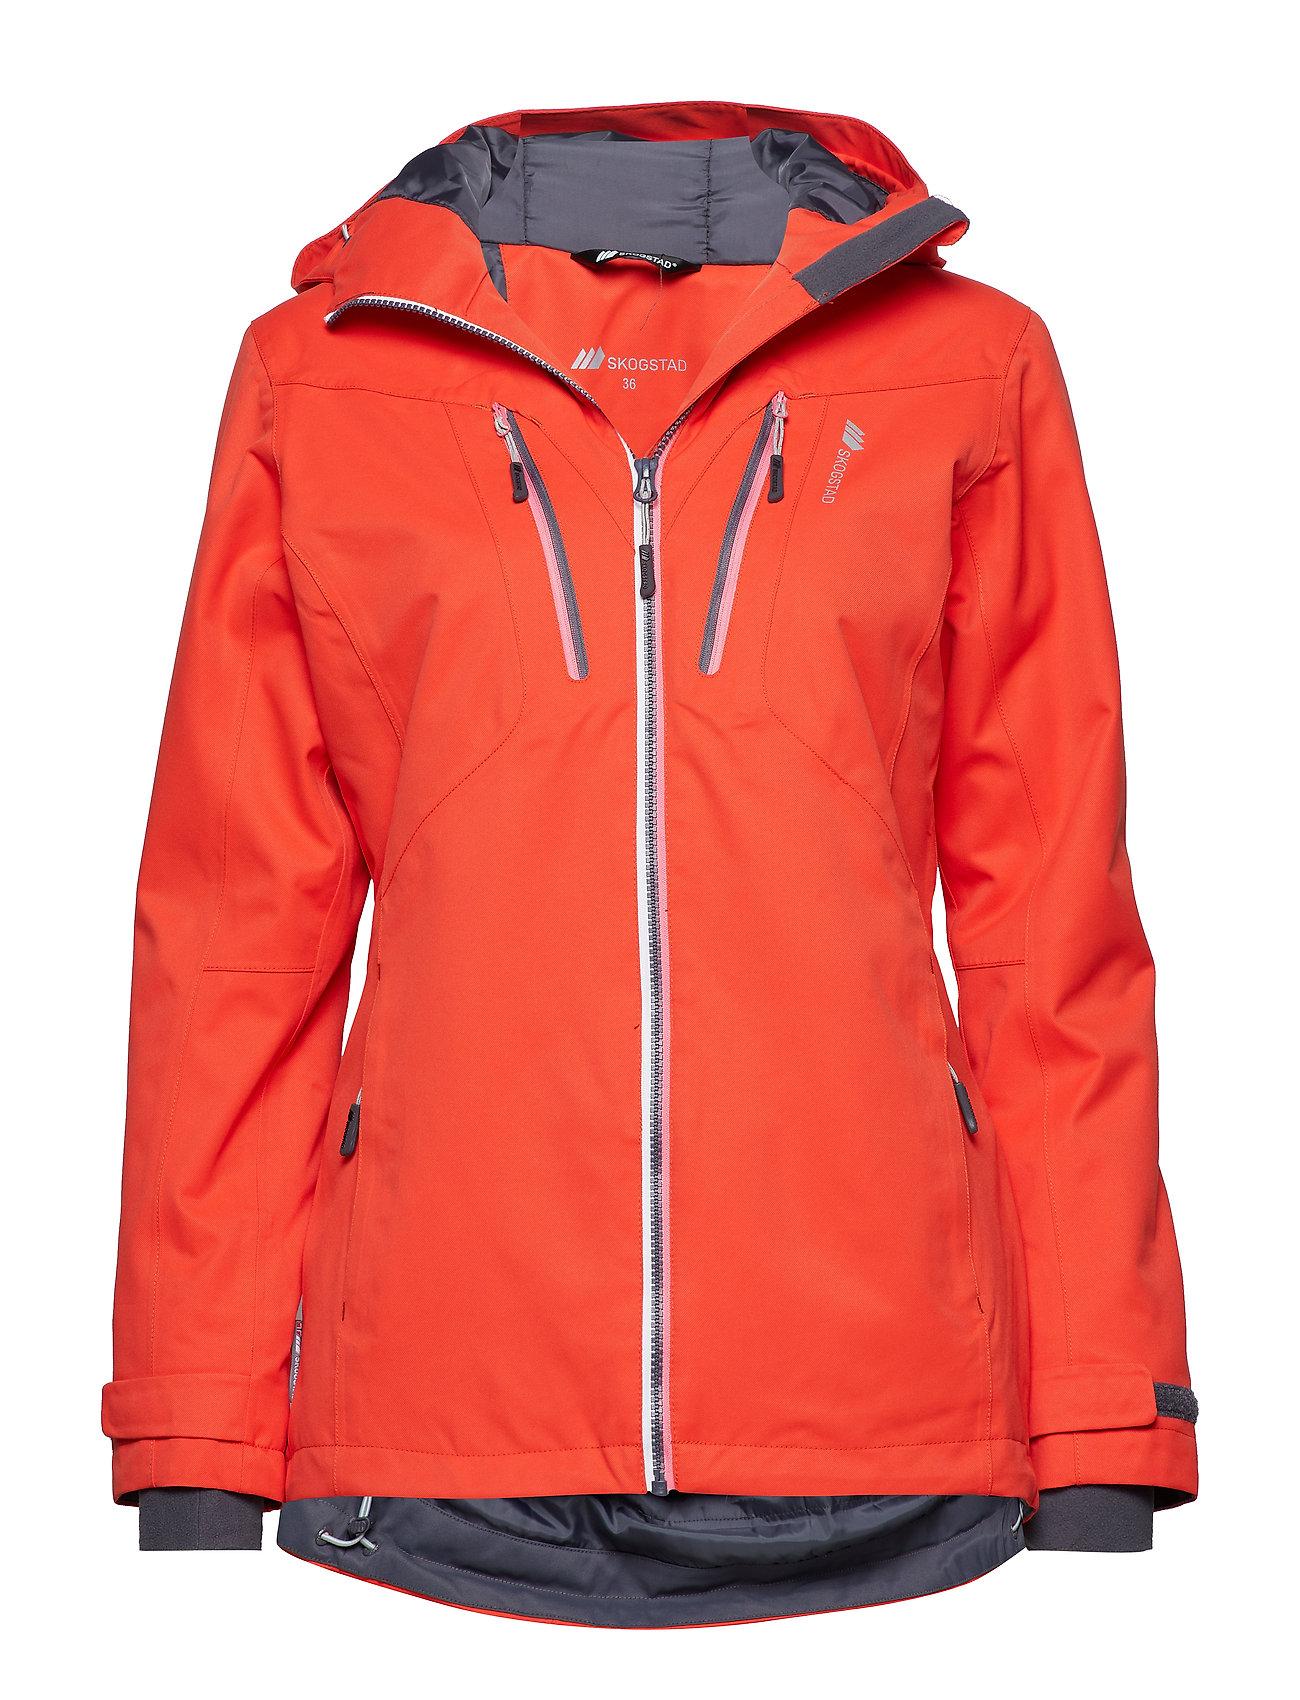 Skogstad Halkebakken 2-layer technical jacket